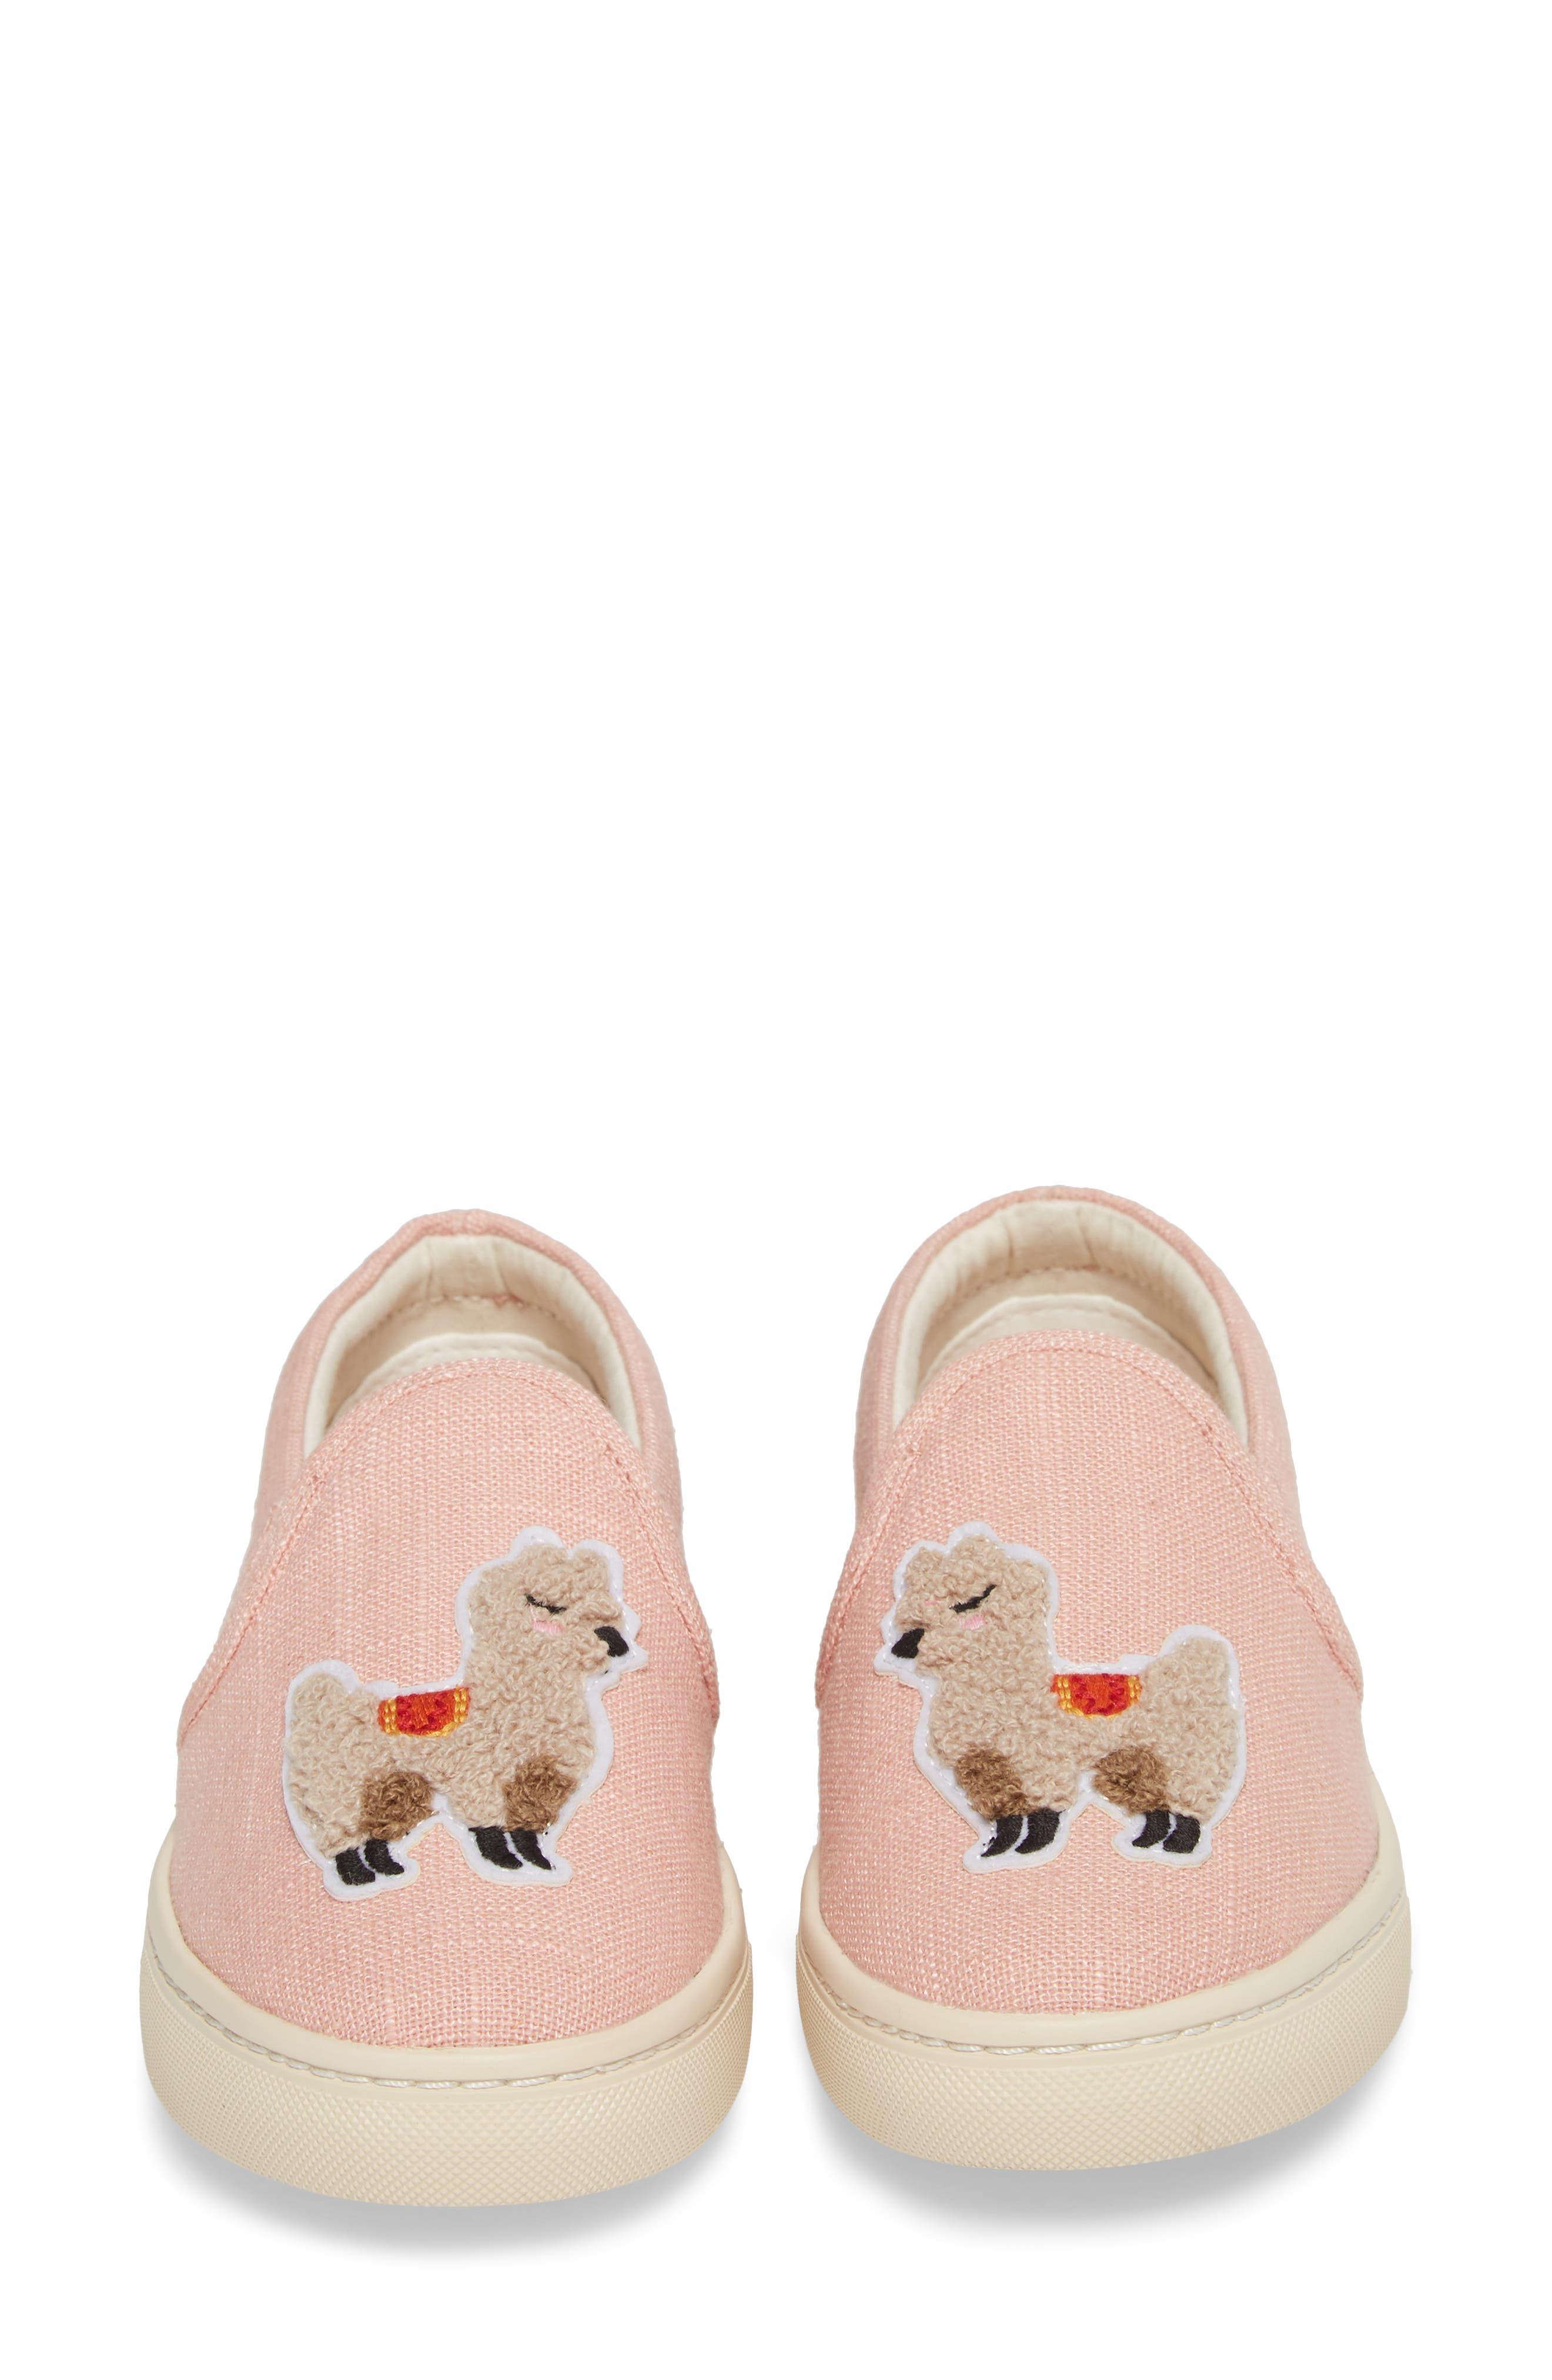 Llama Slip-On Sneaker,                             Alternate thumbnail 5, color,                             684